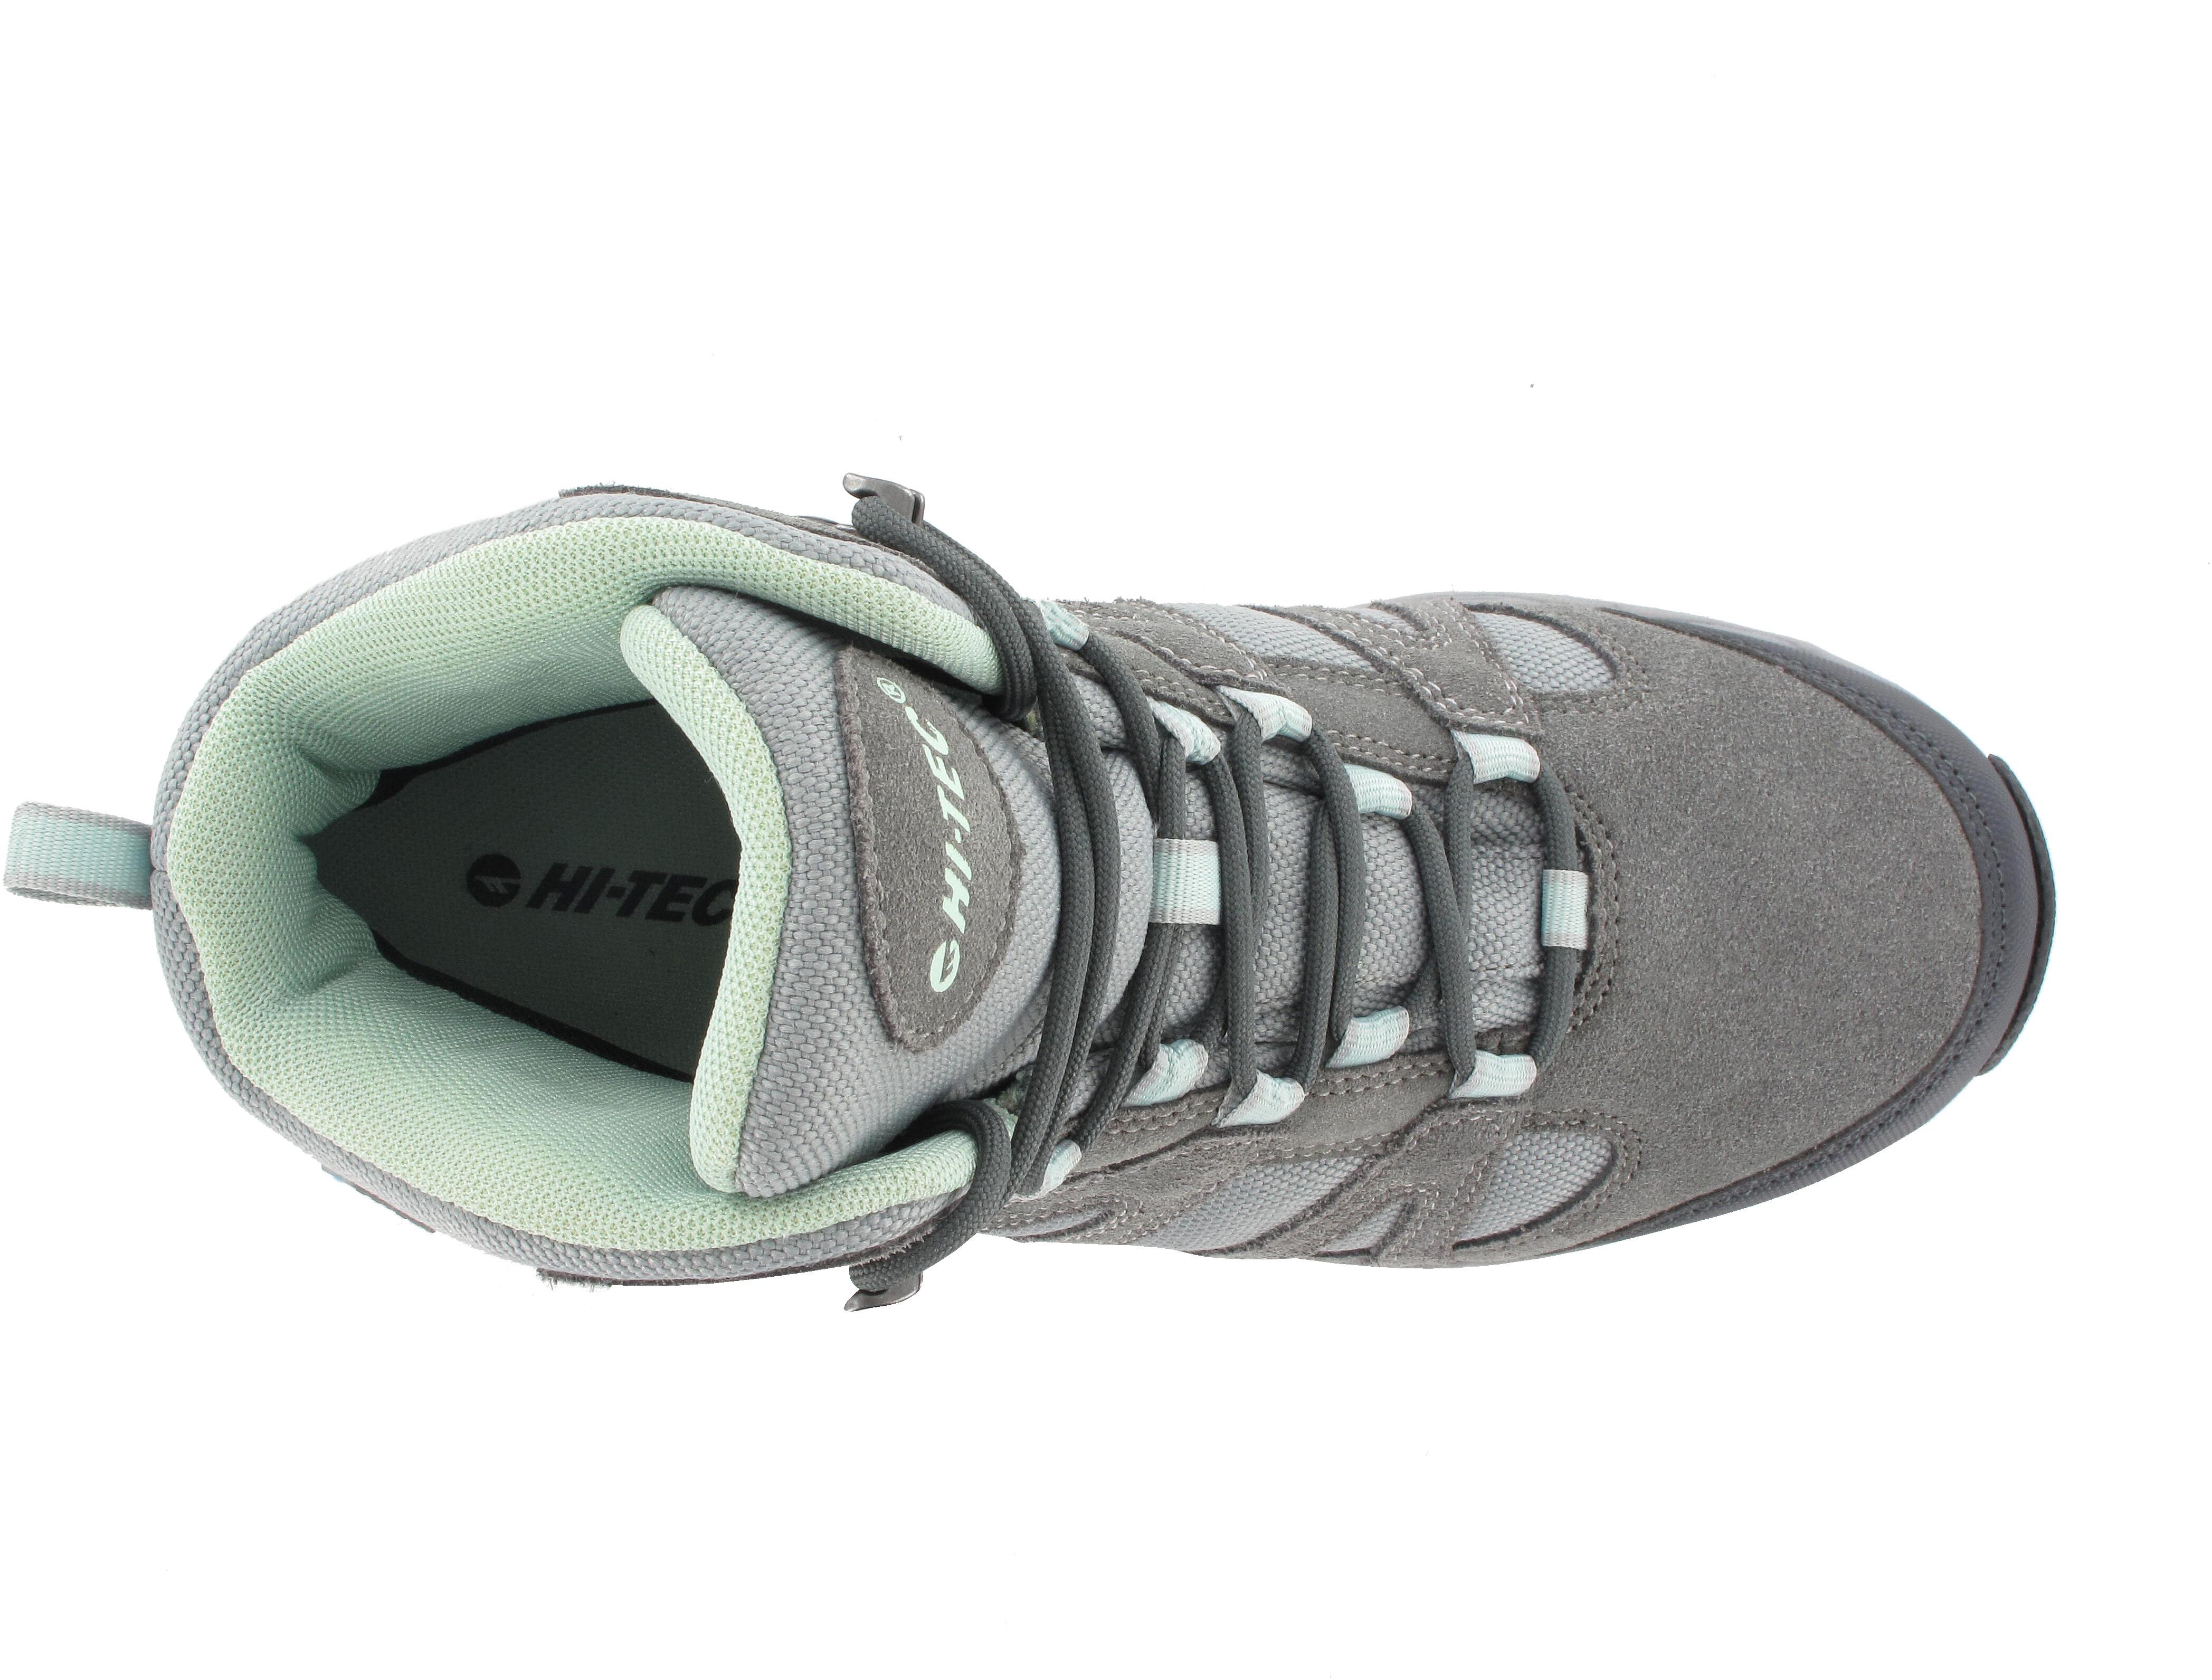 7e8c39dfac0b Hi-Tec Alto II Mid WP - Chaussures Femme - gris sur CAMPZ !